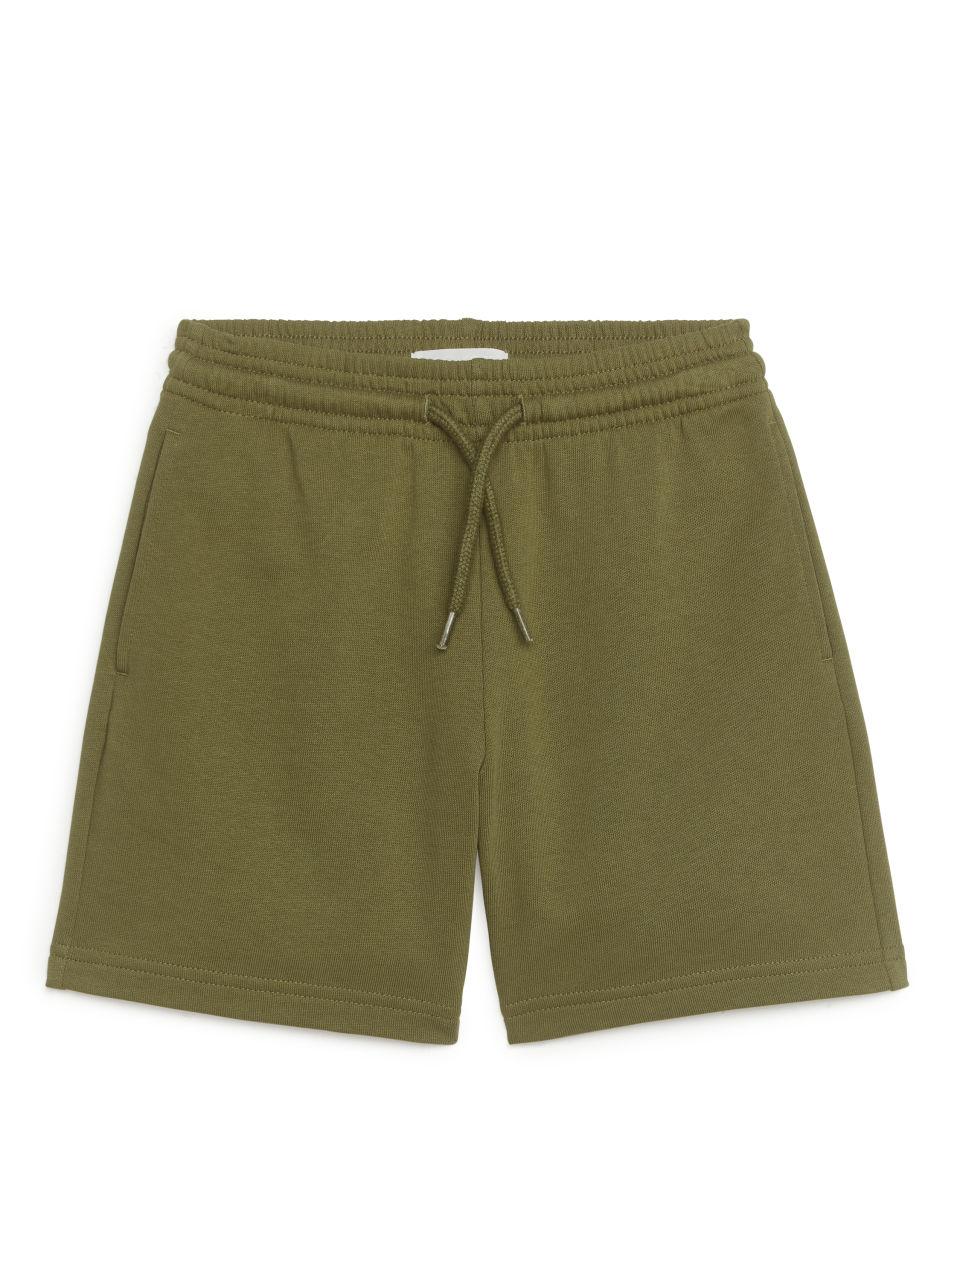 Sweatshirt Shorts - Green